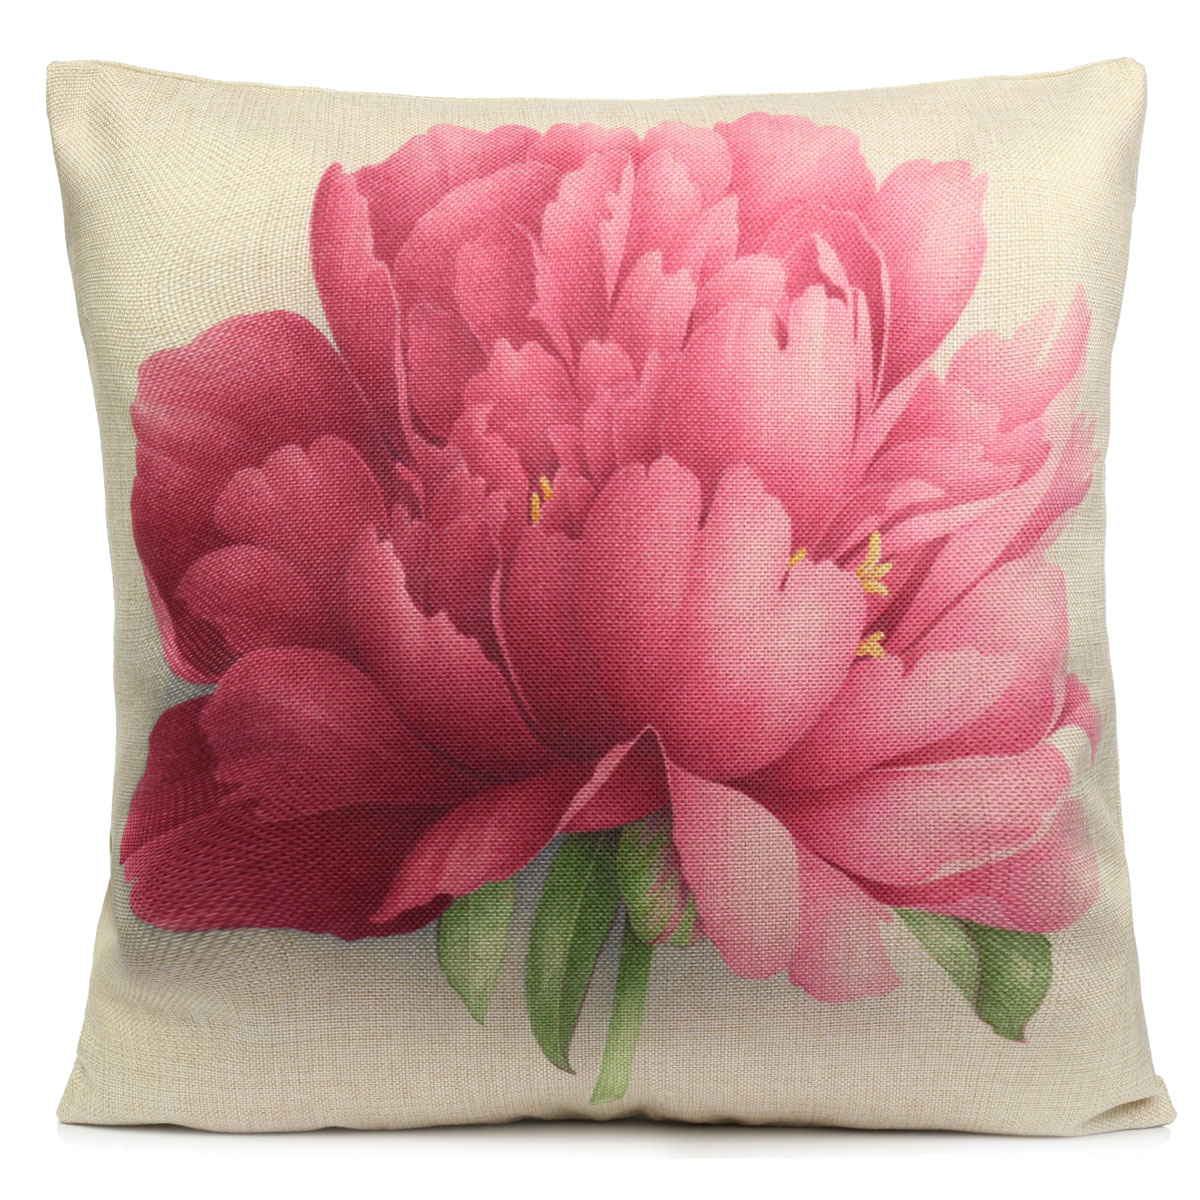 Rose Flowers Cotton Linen Throw Pillow Case Sofa Bed Car Cushion